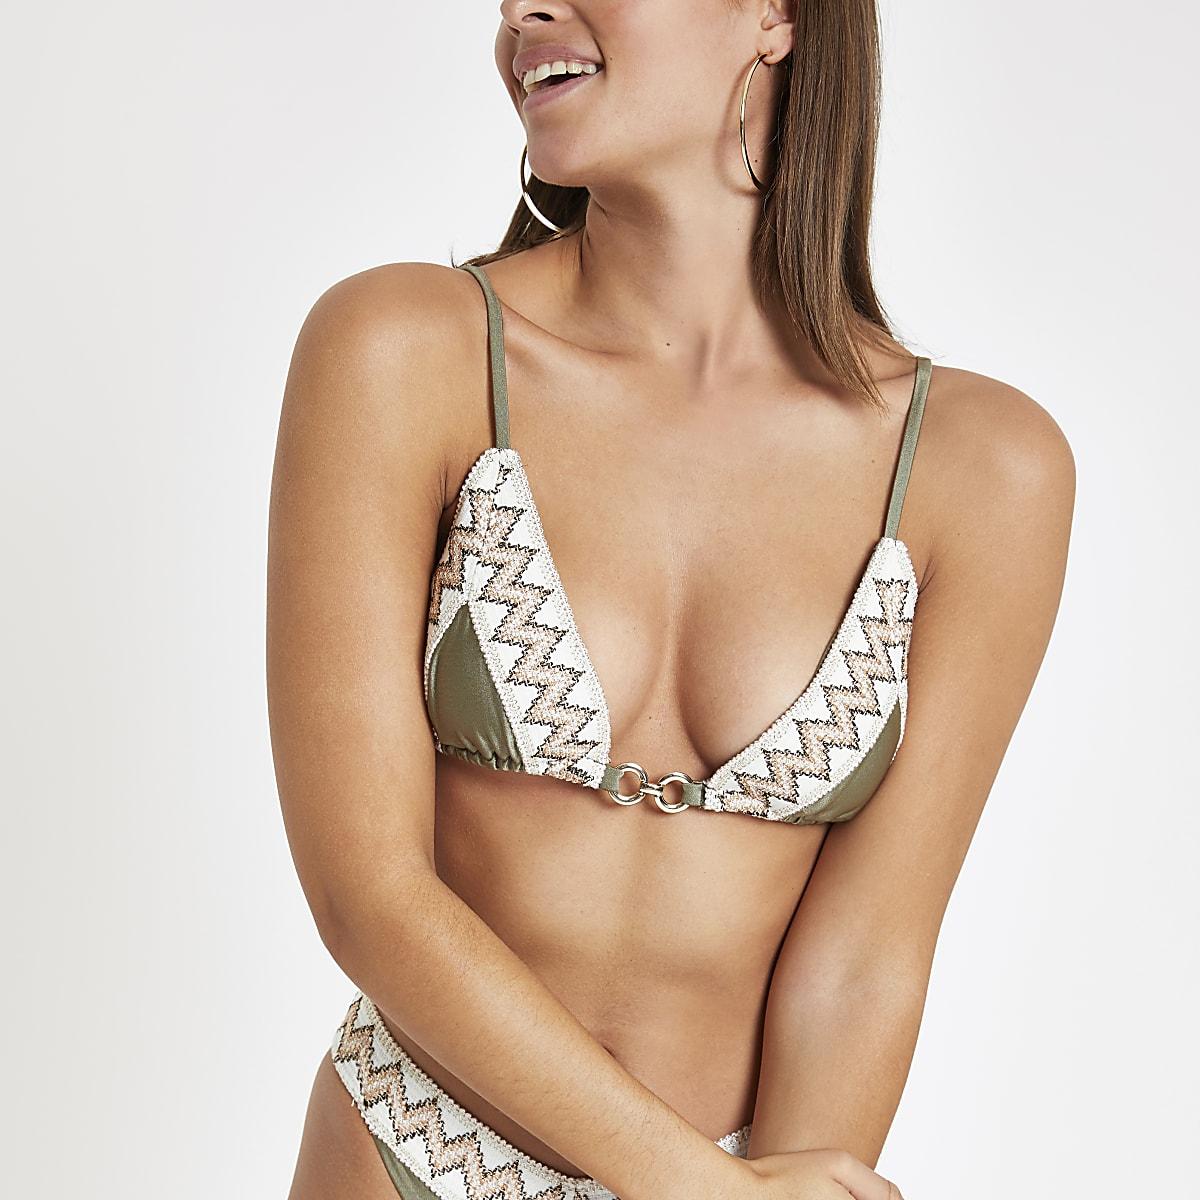 Haut de bikini triangle kaki avec bordure élastique